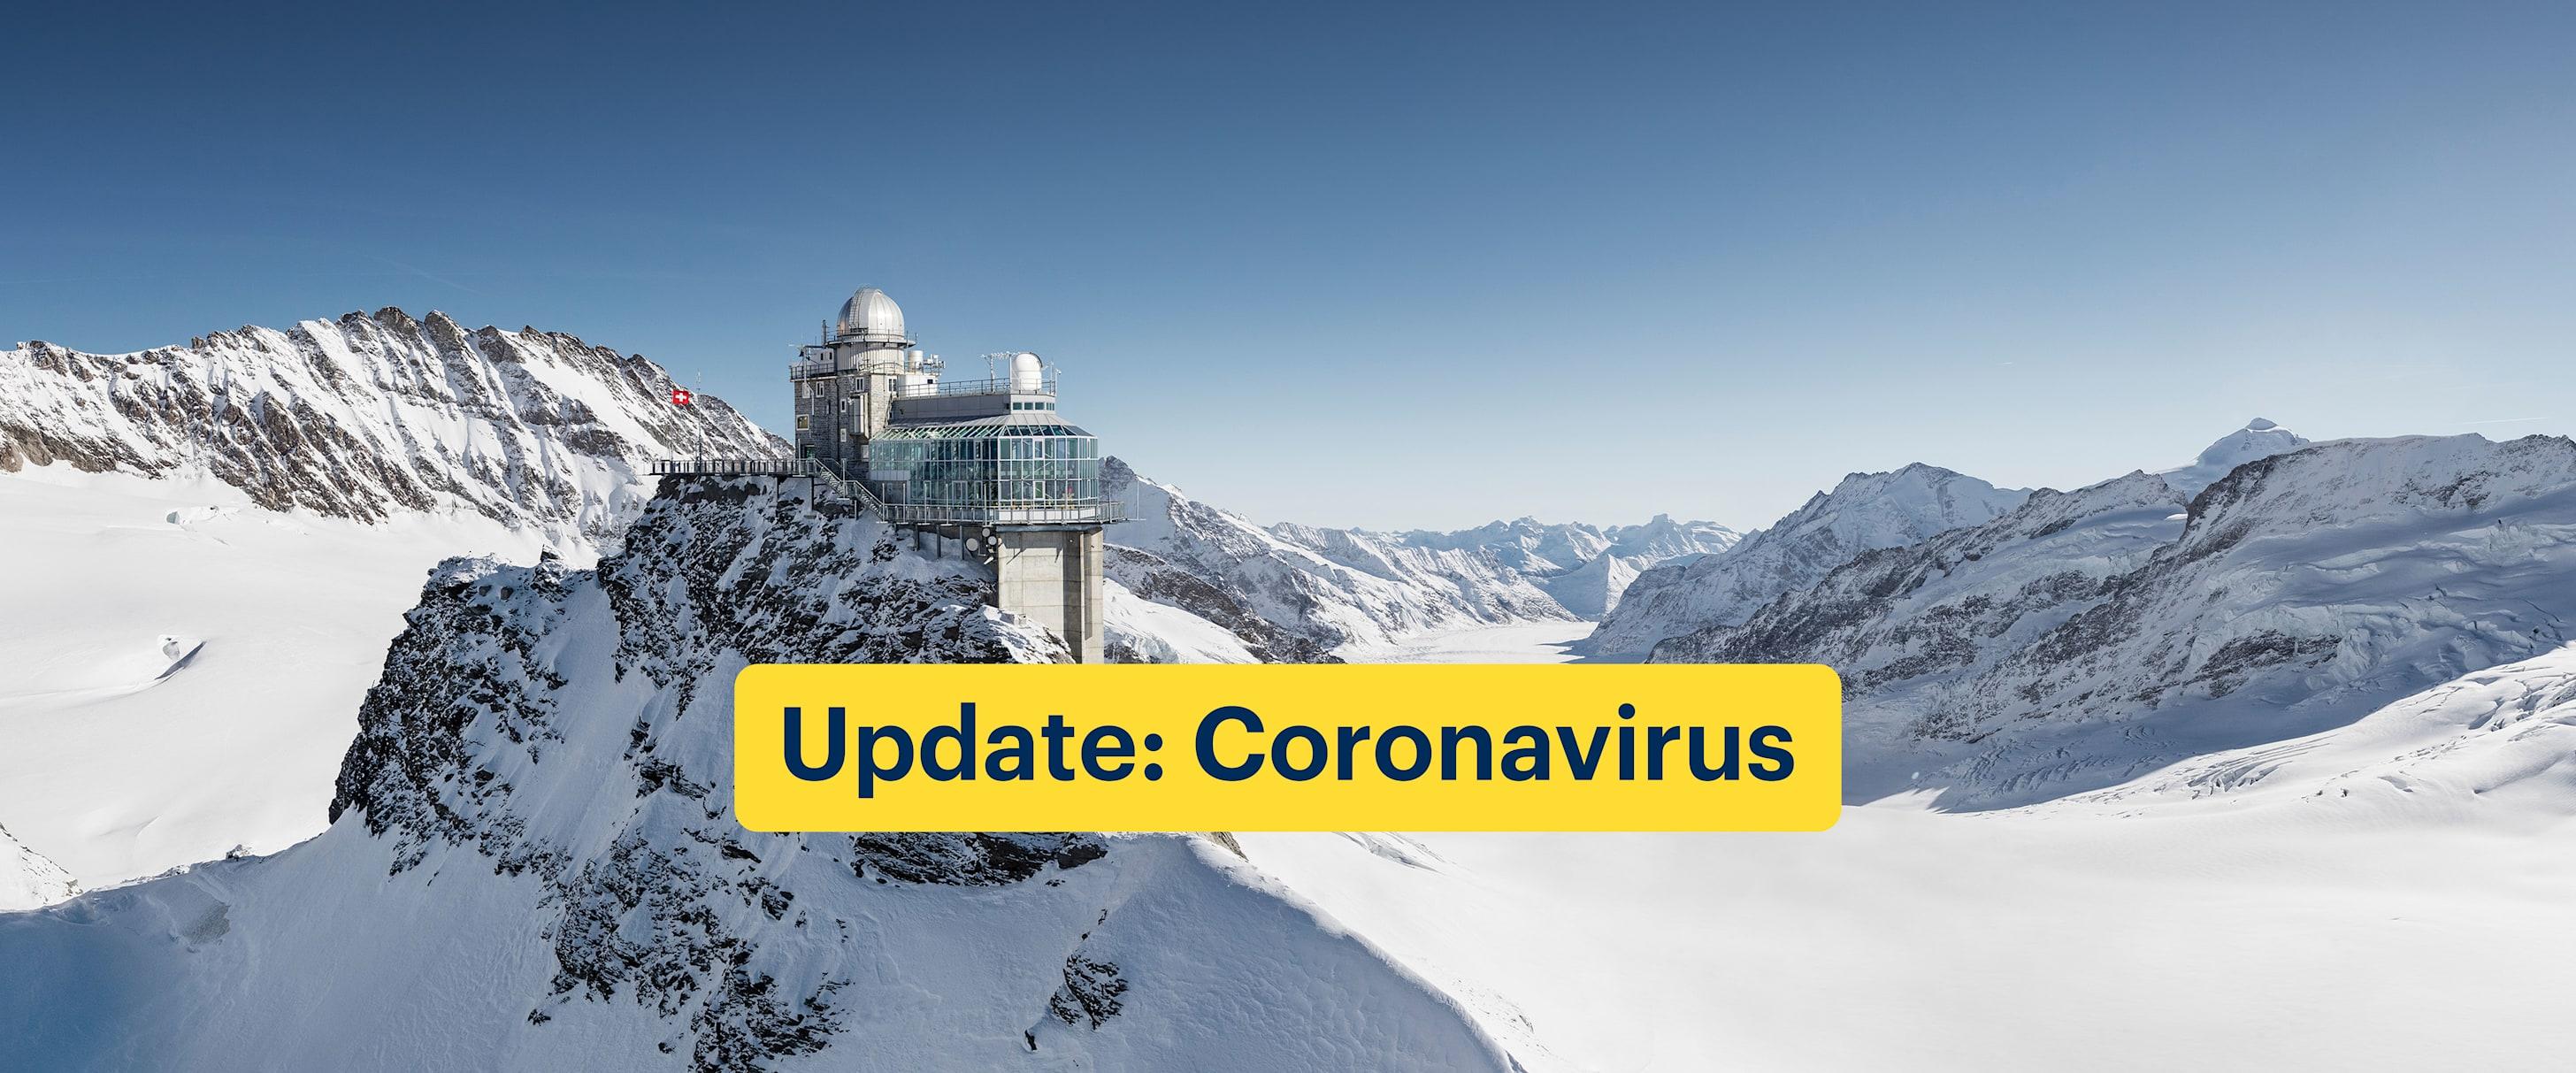 Update Coronavirus Landing Page Geschlossen